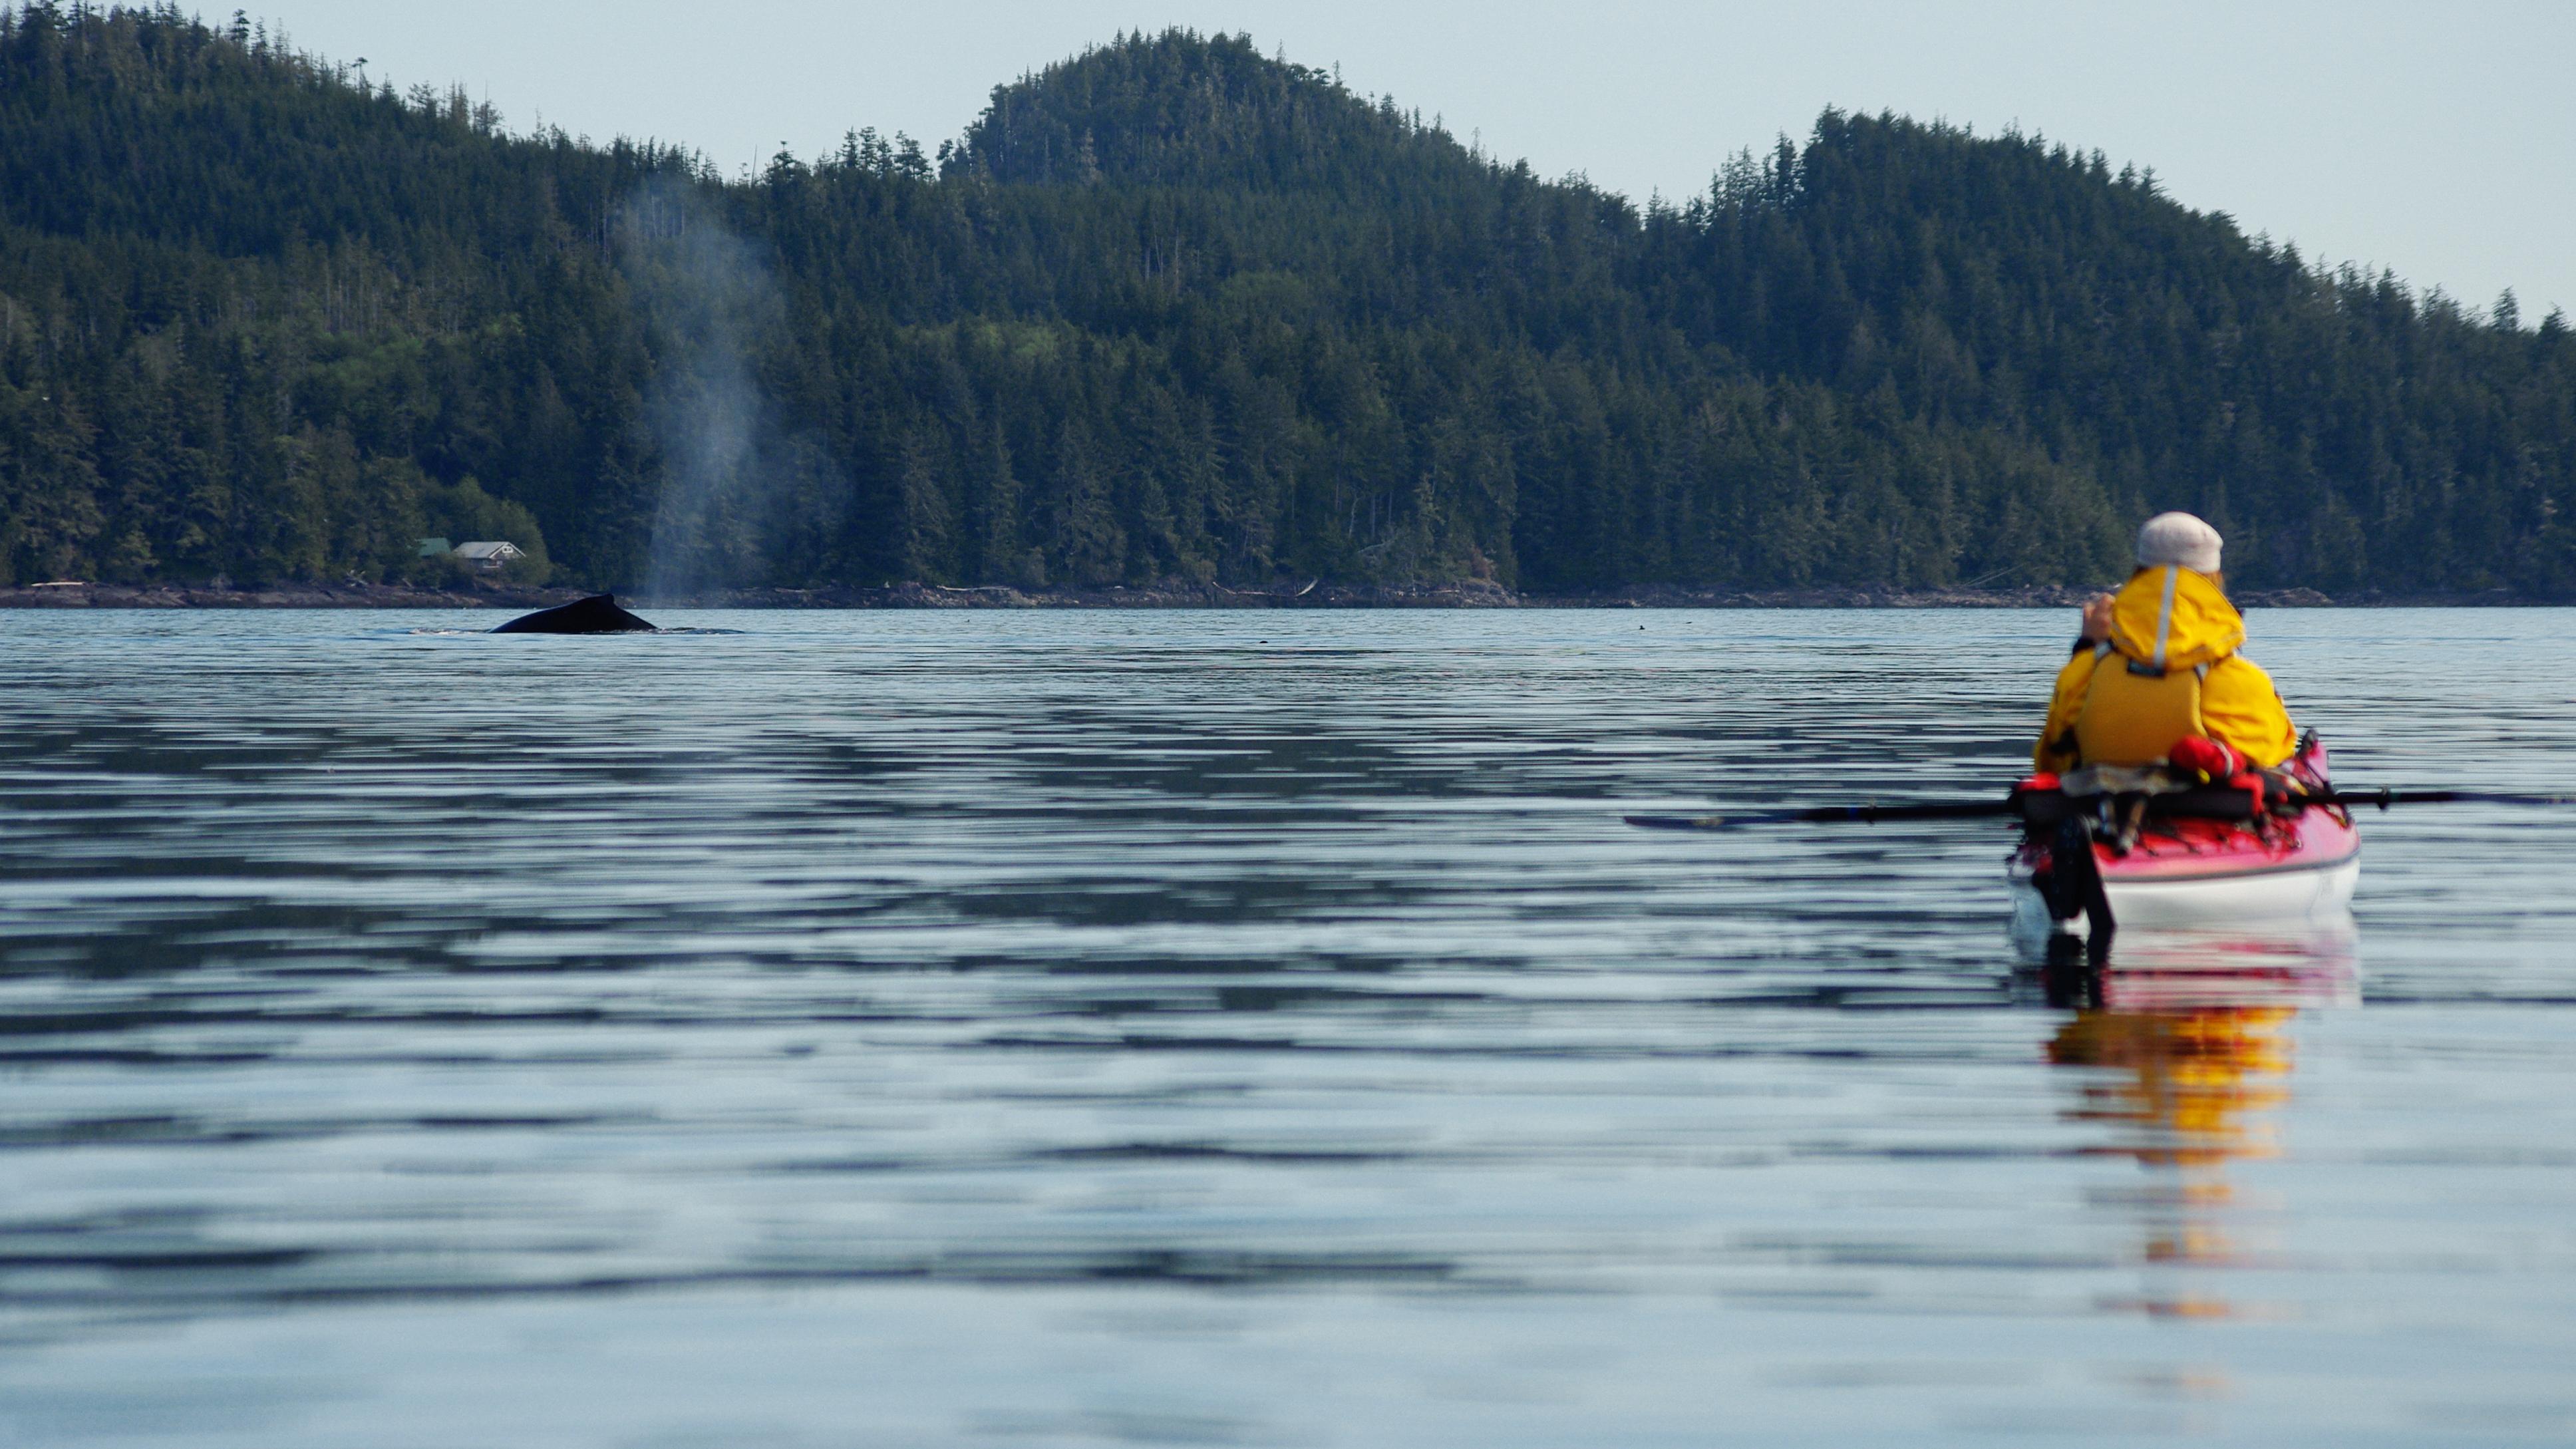 Kingfisher Resort Vancouver Island Owner